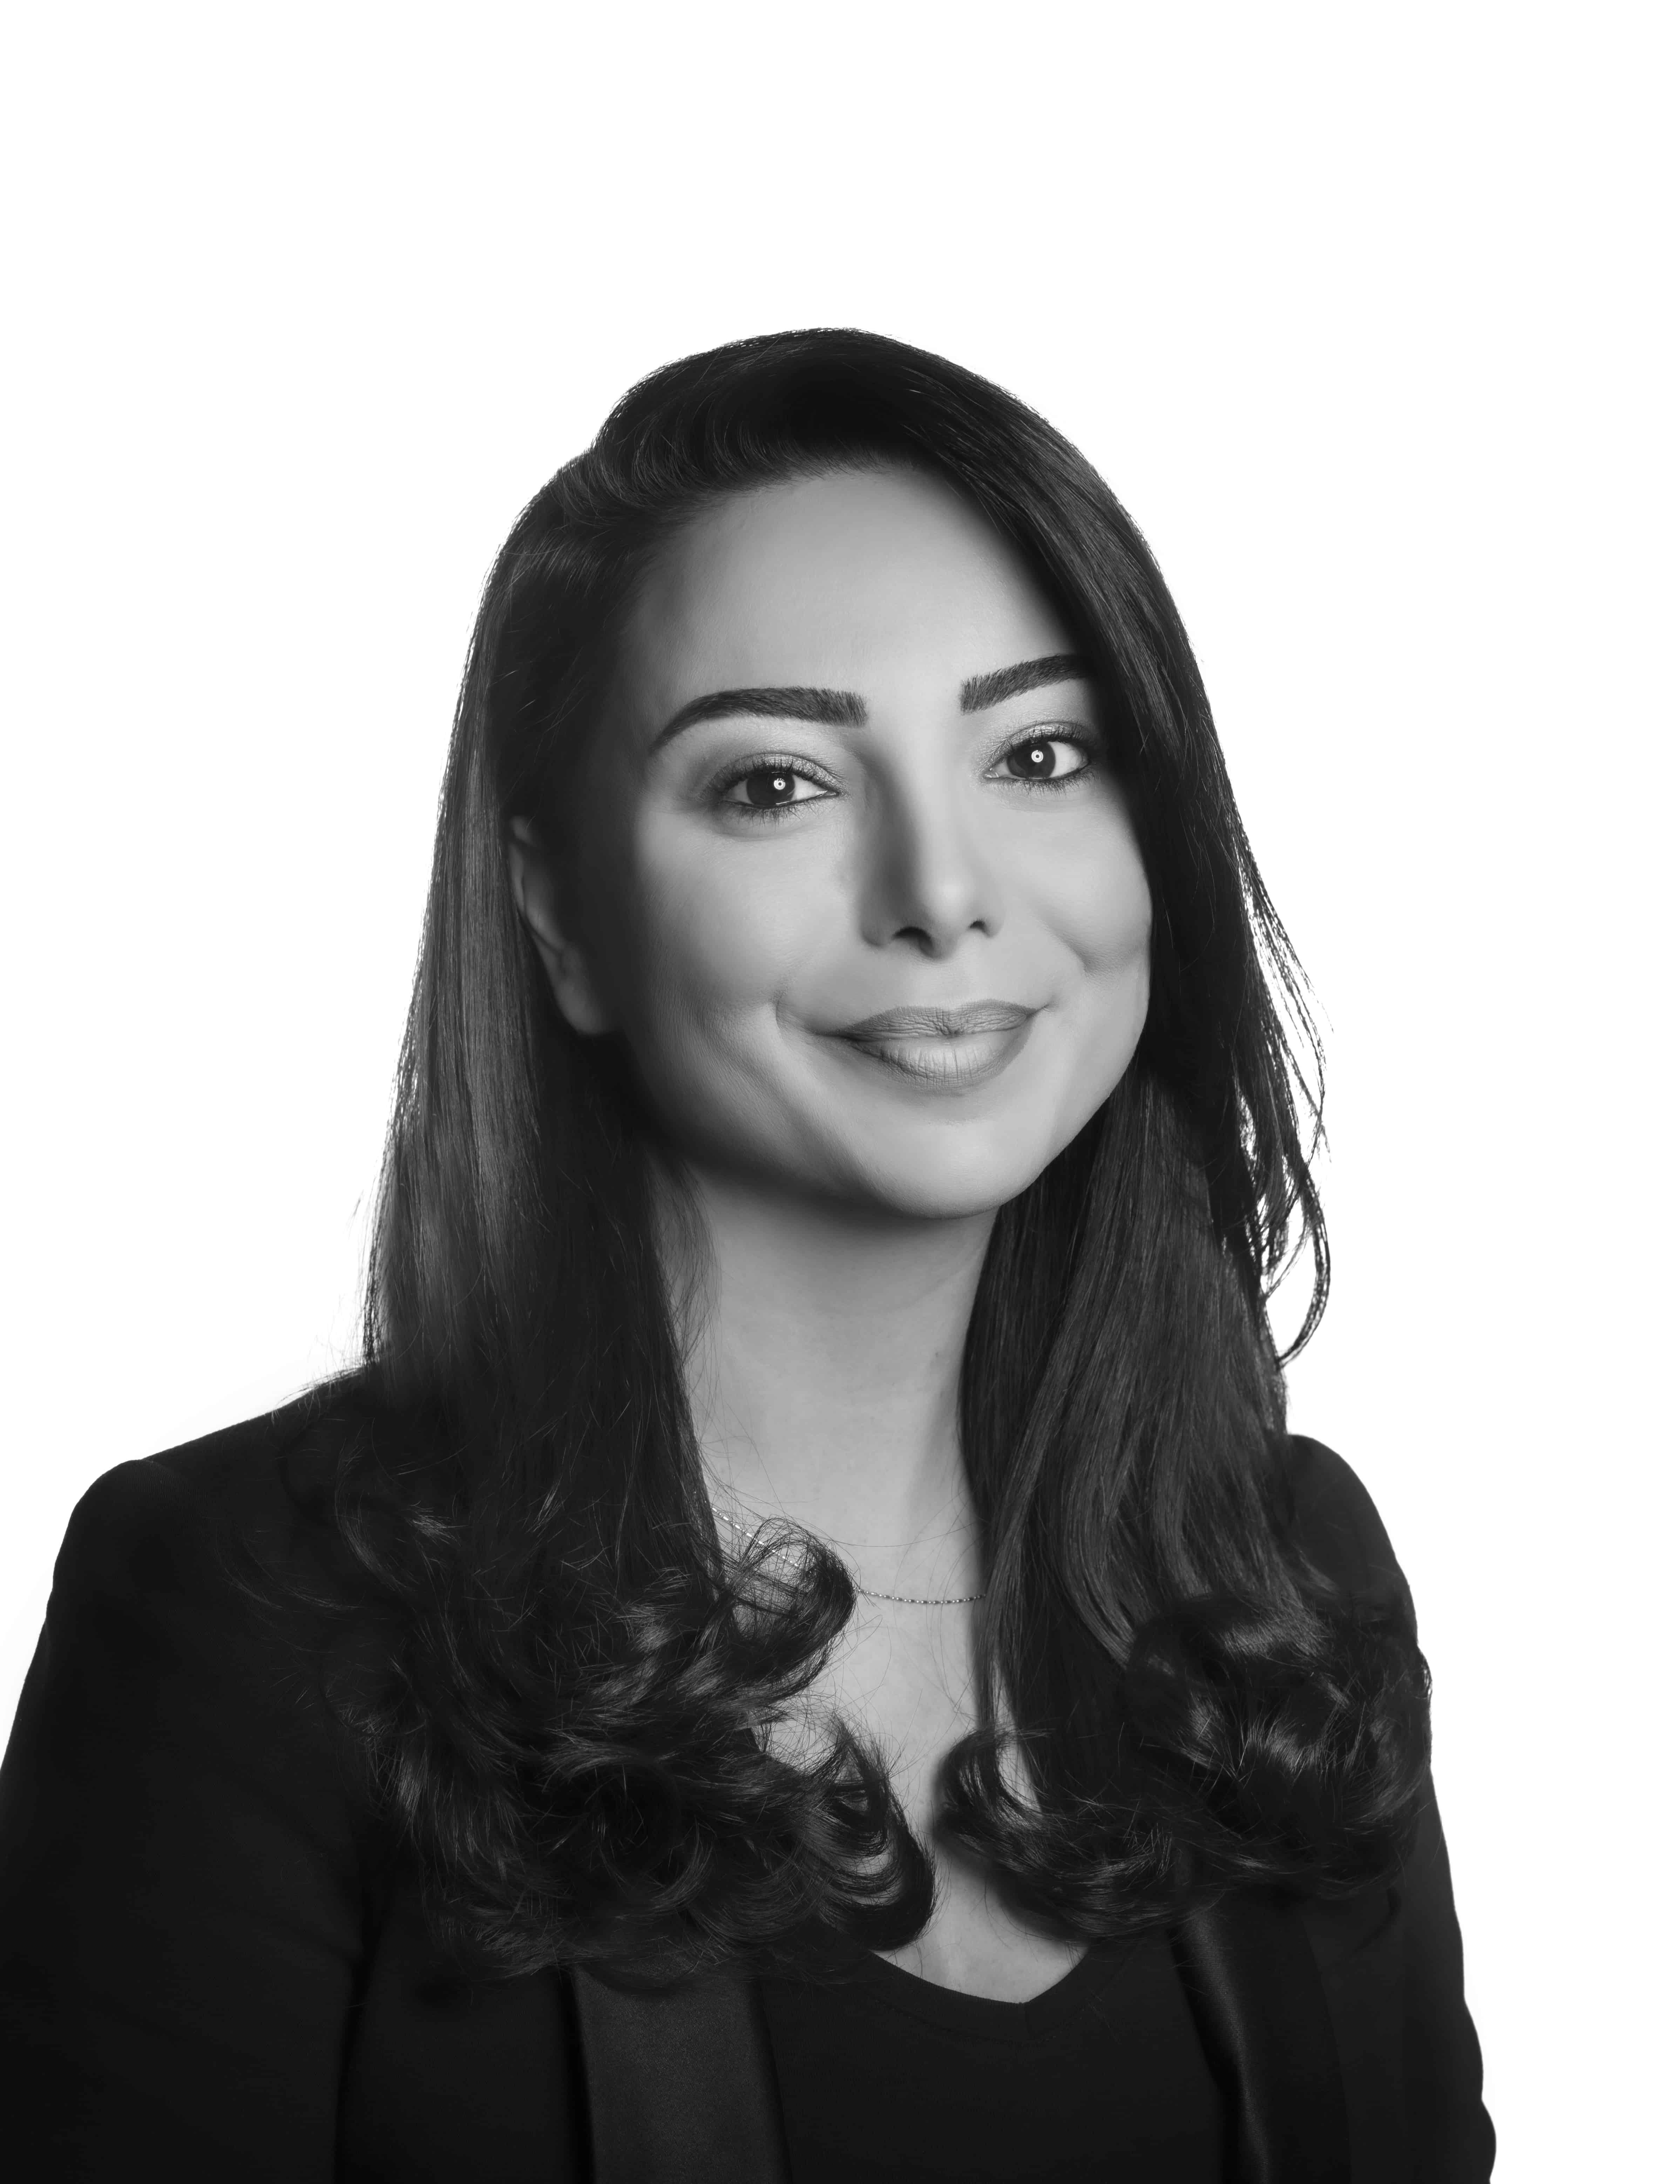 Sonja Khodadad Zadeh